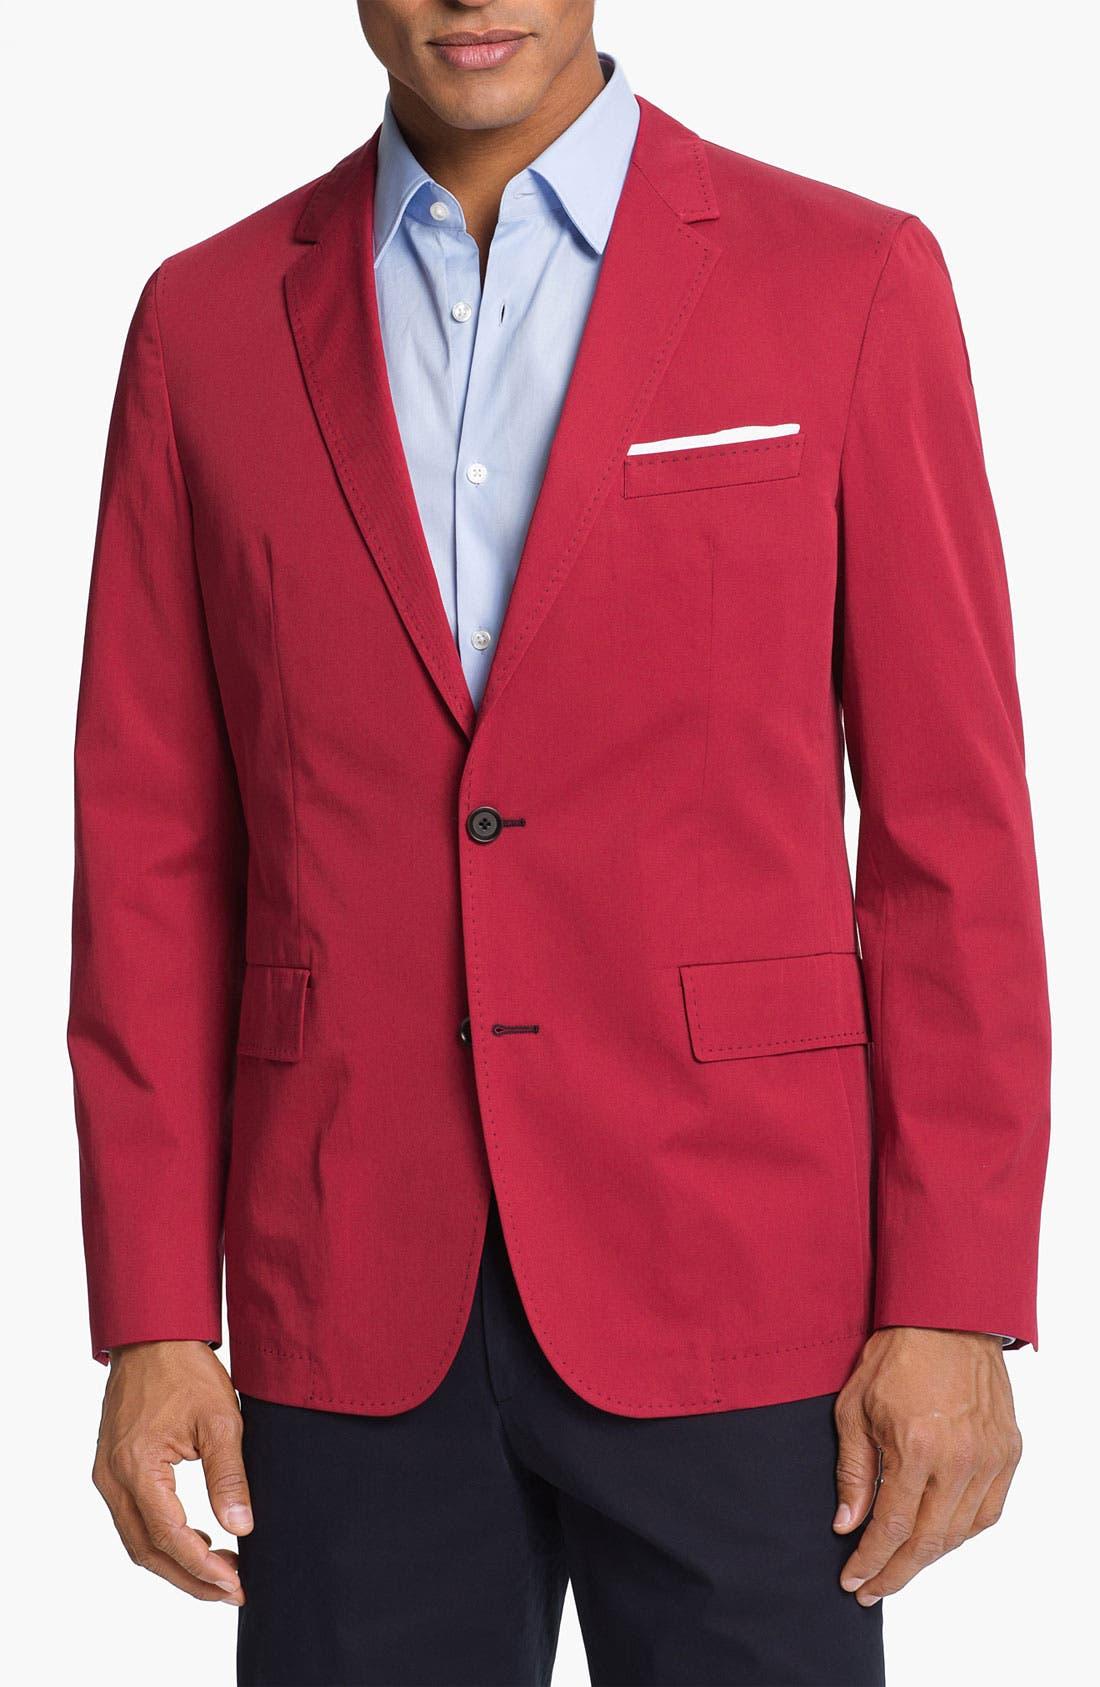 Alternate Image 1 Selected - BOSS HUGO BOSS 'Miles' Trim Fit Cotton Blazer (Online Only)